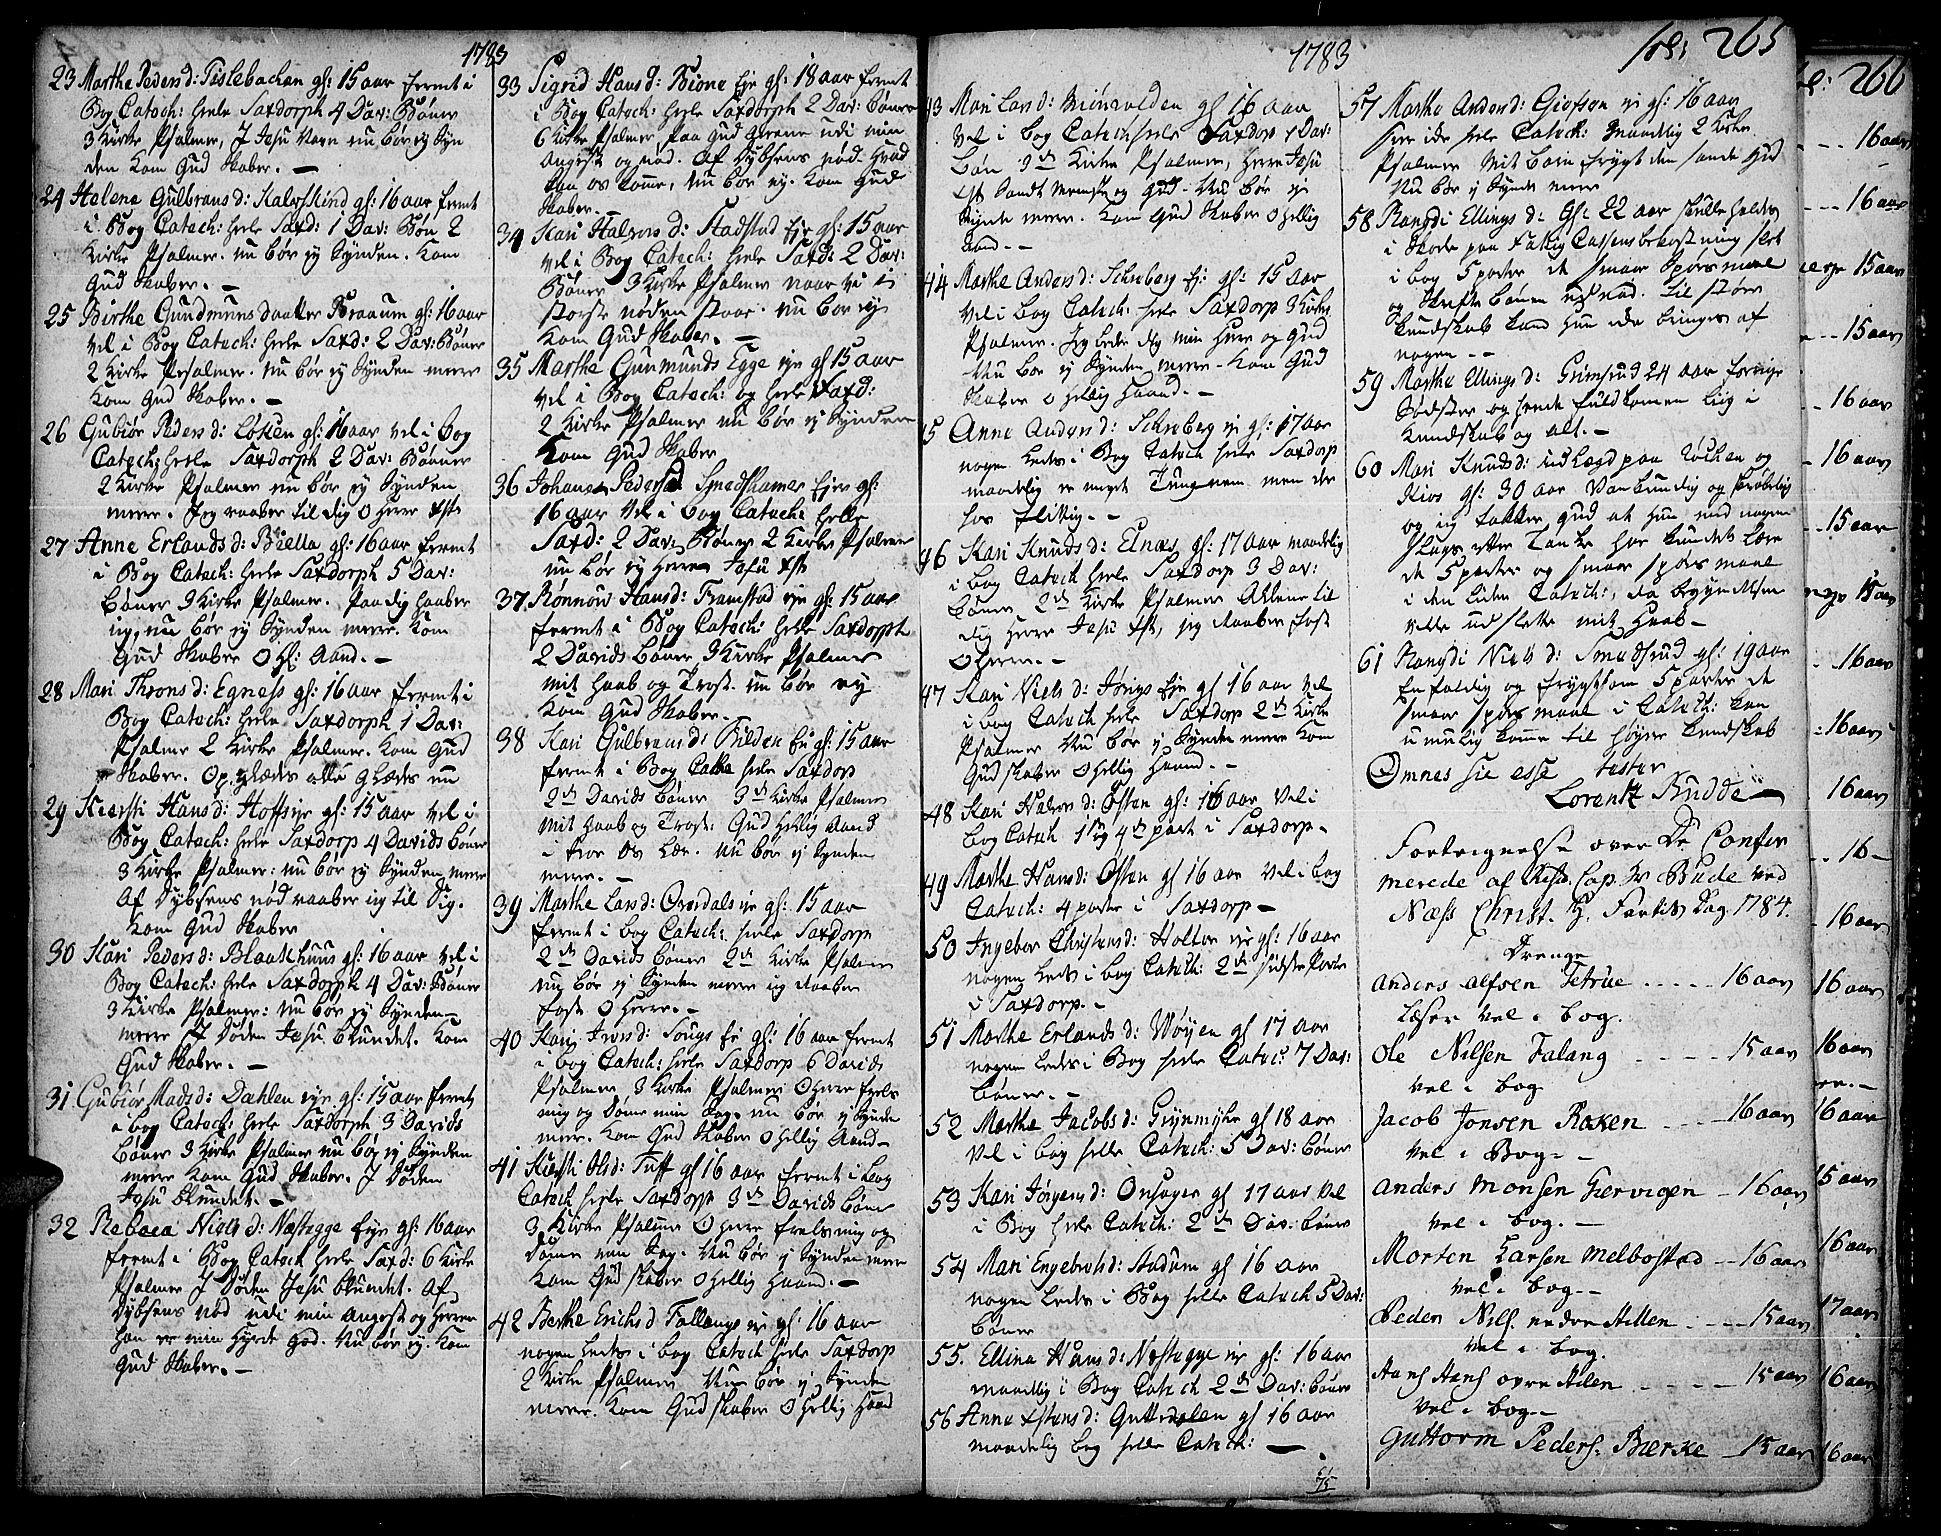 SAH, Gran prestekontor, Ministerialbok nr. 5, 1776-1788, s. 265